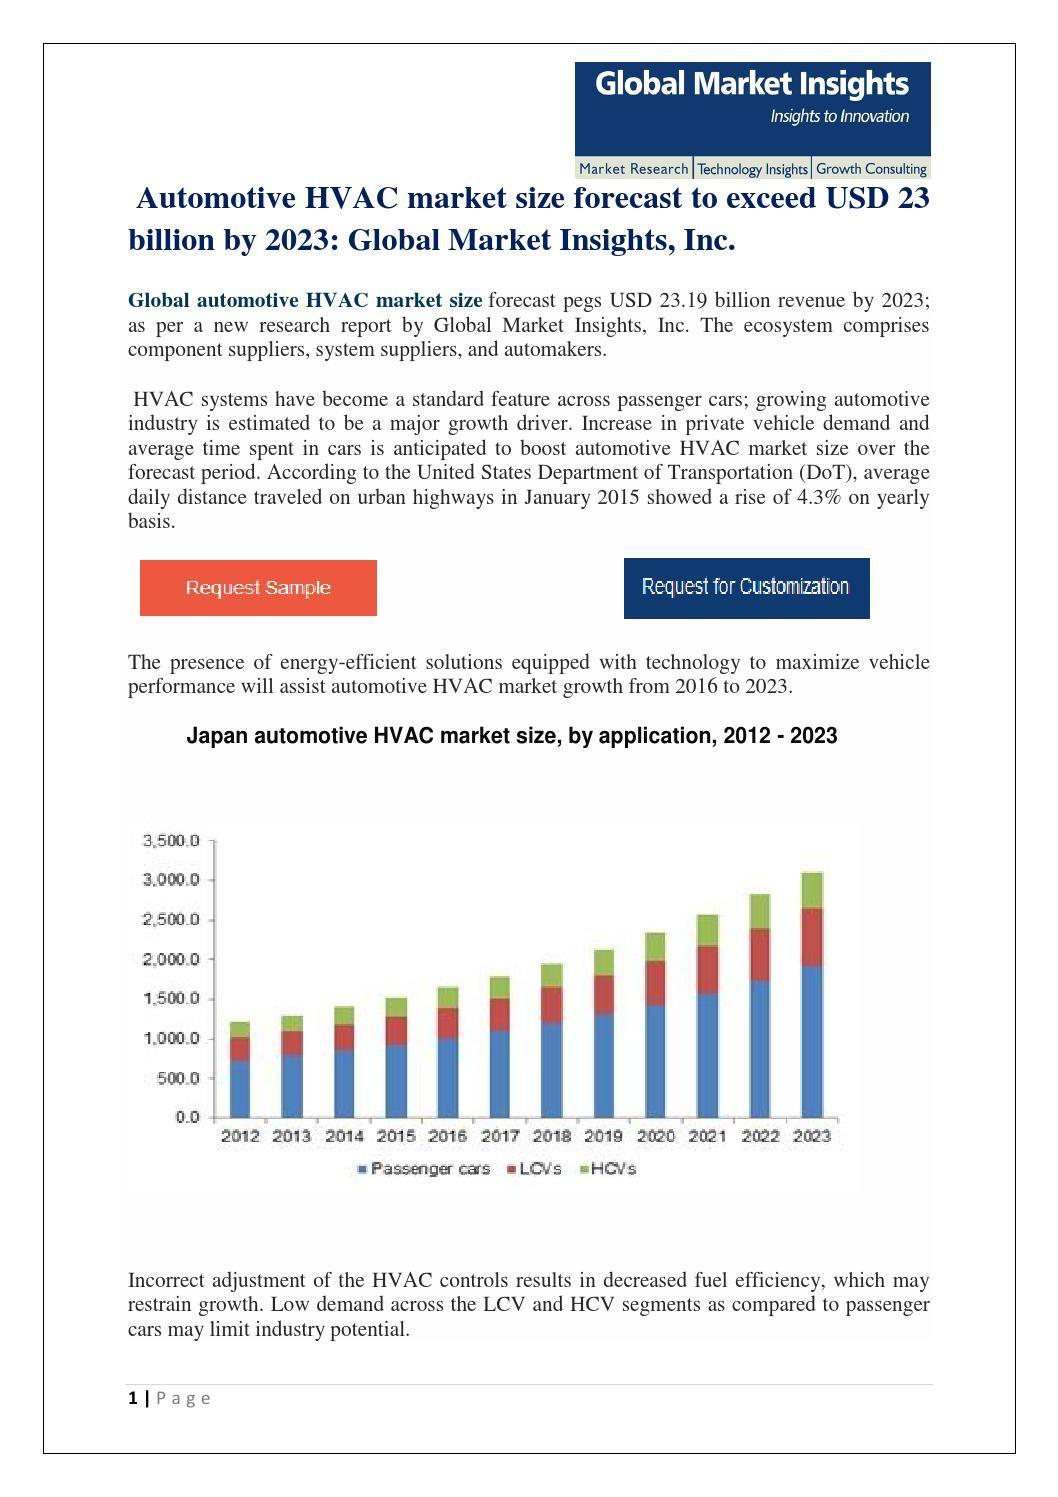 Global Automotive Hvac Market Size Forecast To Exceed Usd 23